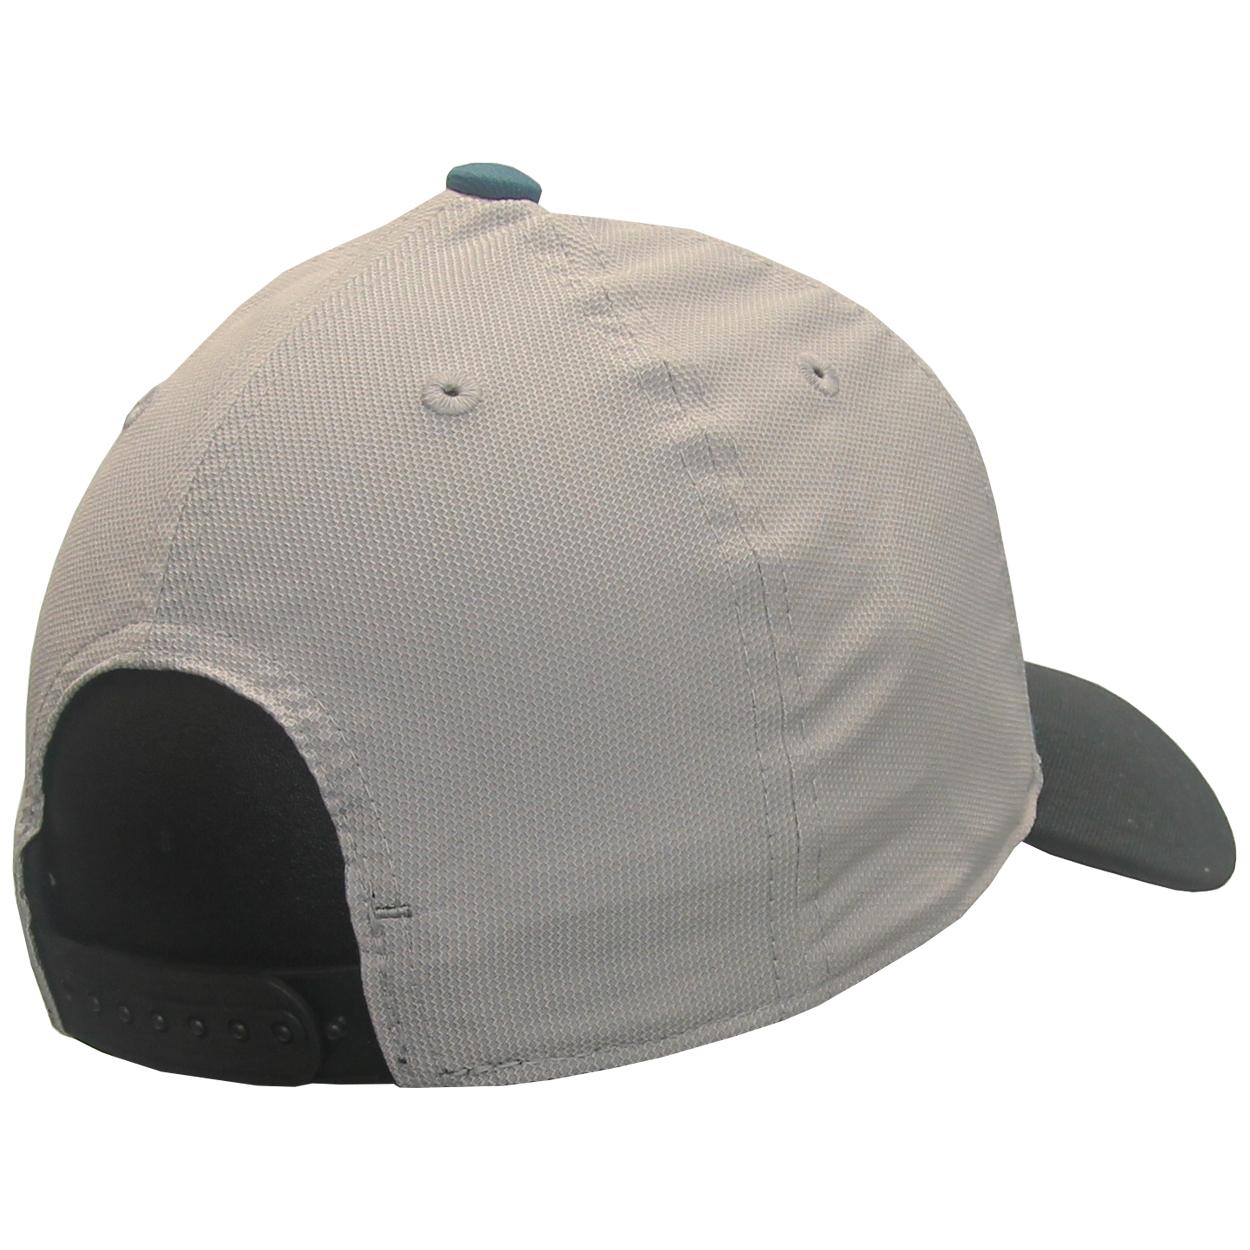 cc4dcdbd Adidas-Patch-Trucker-Adjustable-Golf-Hat-Brand-New thumbnail